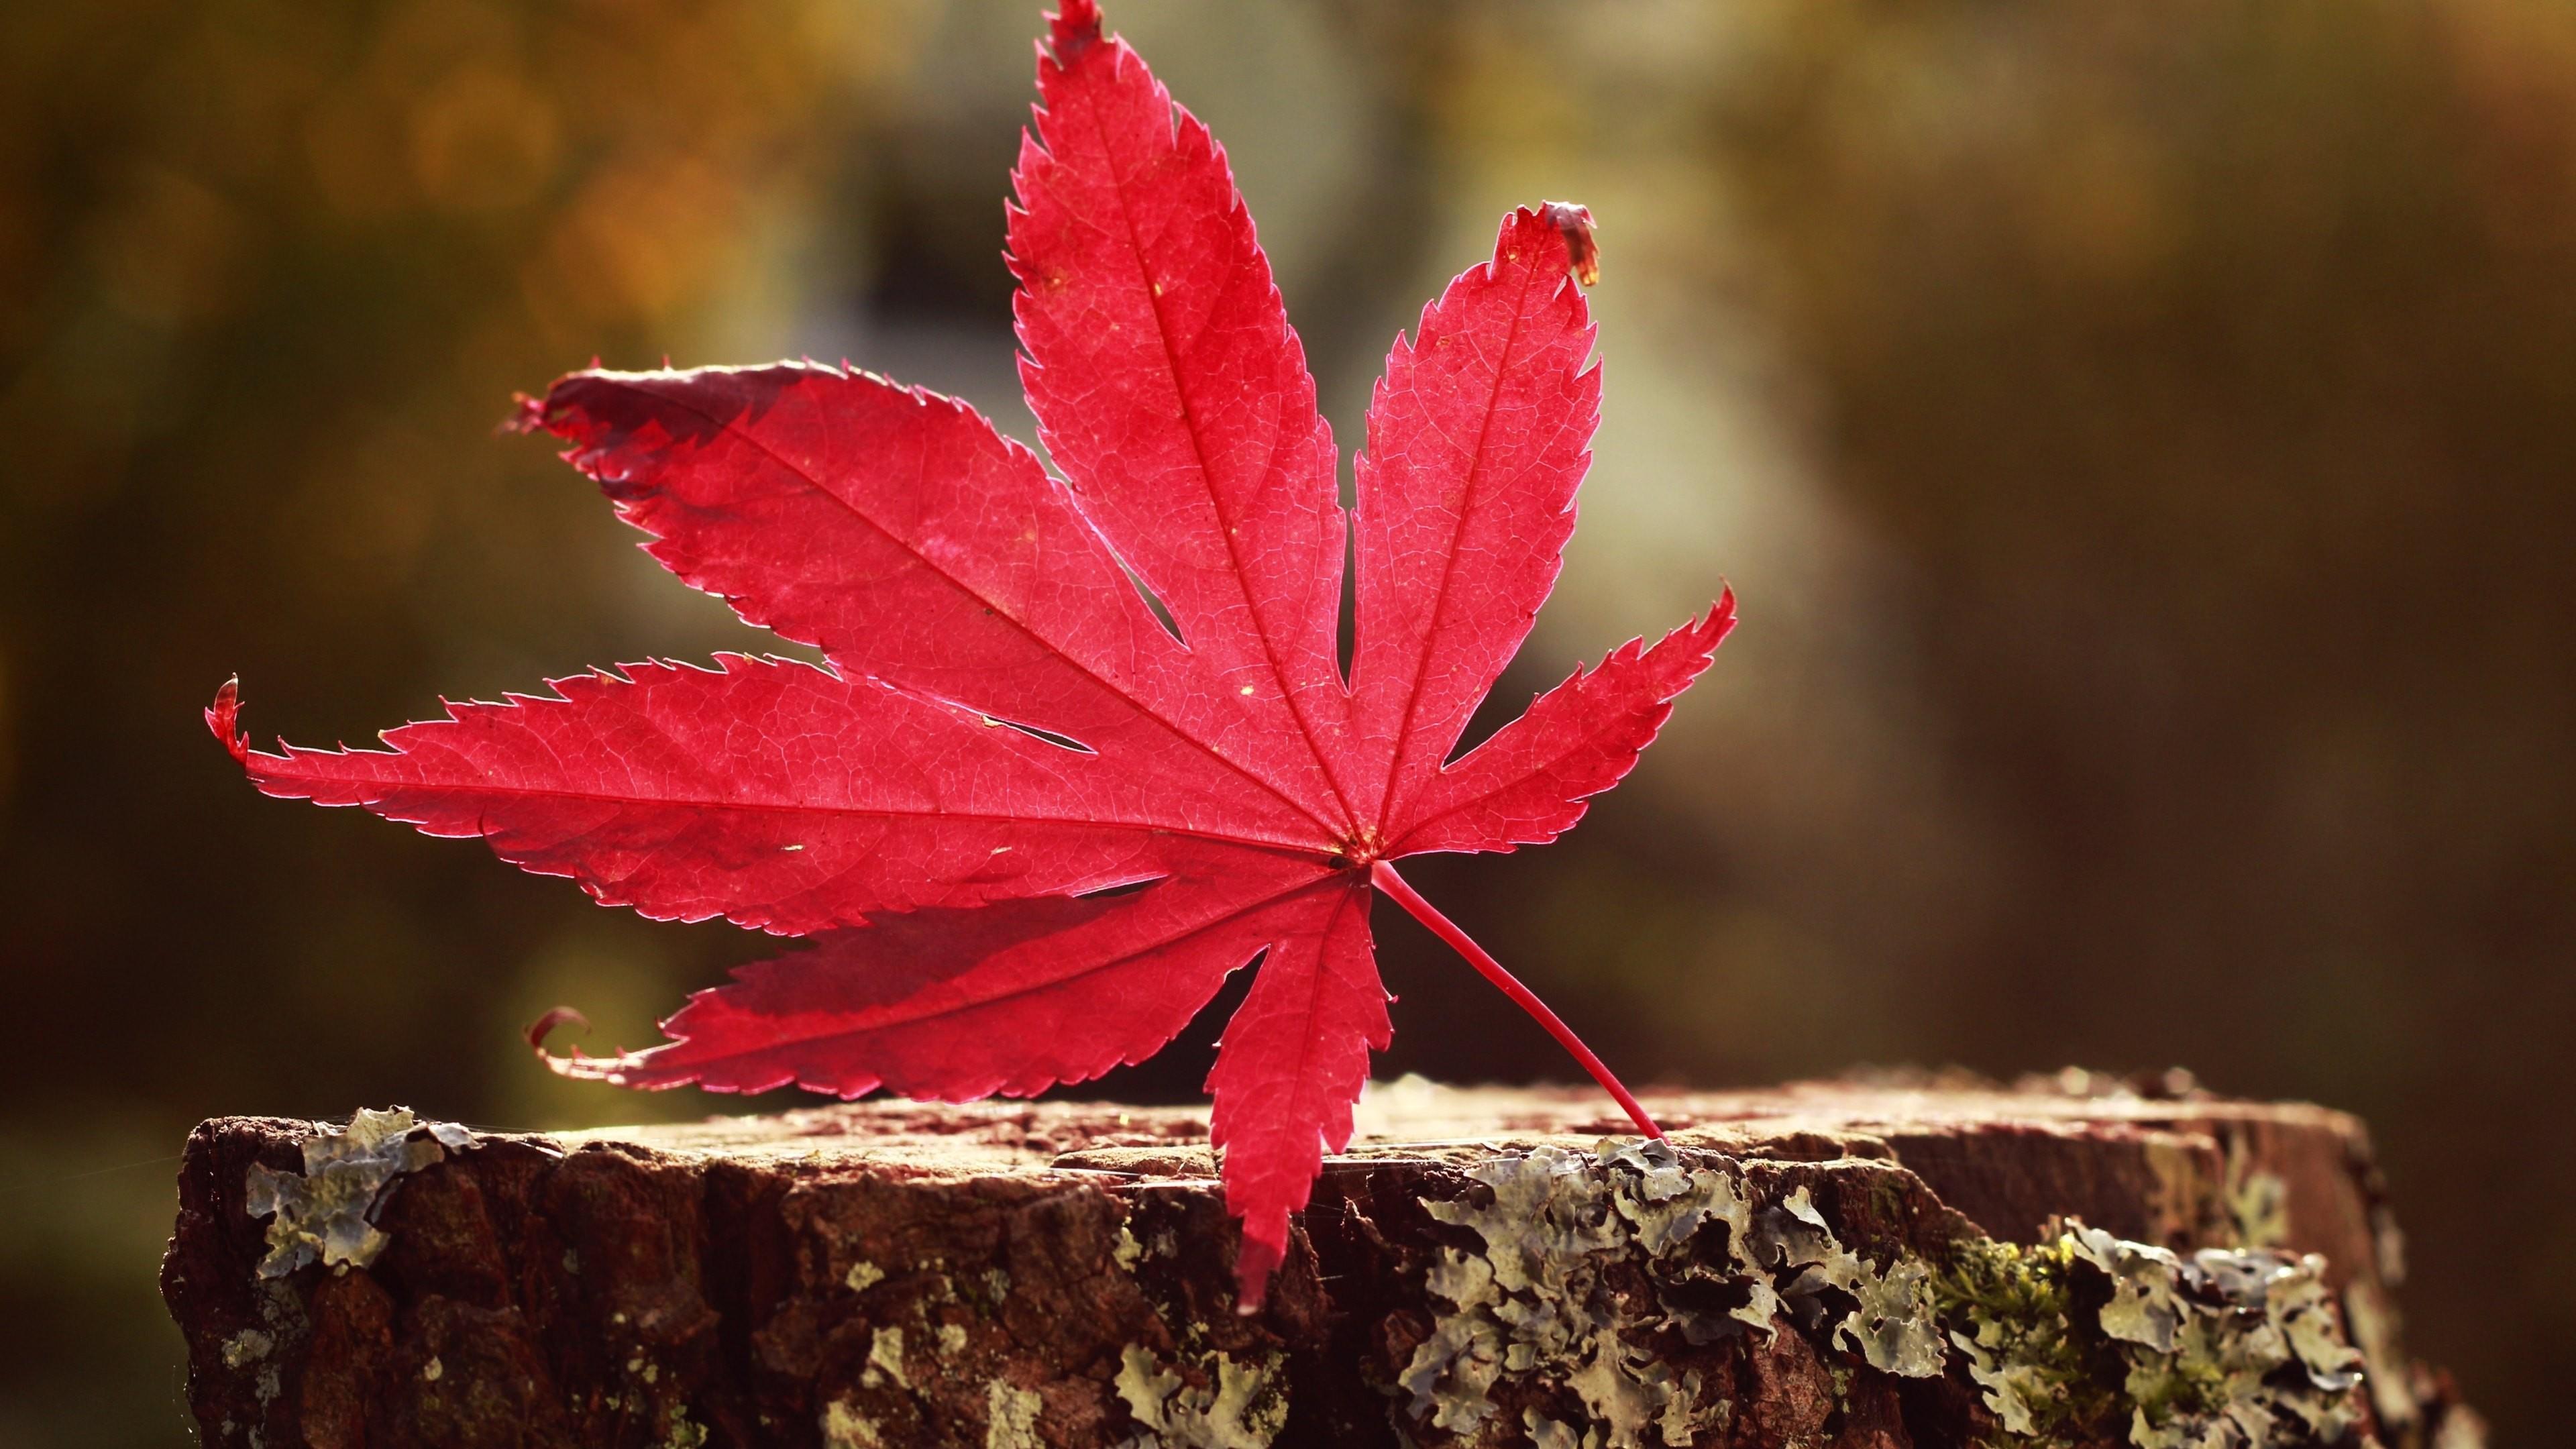 Fall Leaf Iphone Wallpaper 45 Ultra Hd Wallpapers 8k 183 ① Download Free Beautiful Full